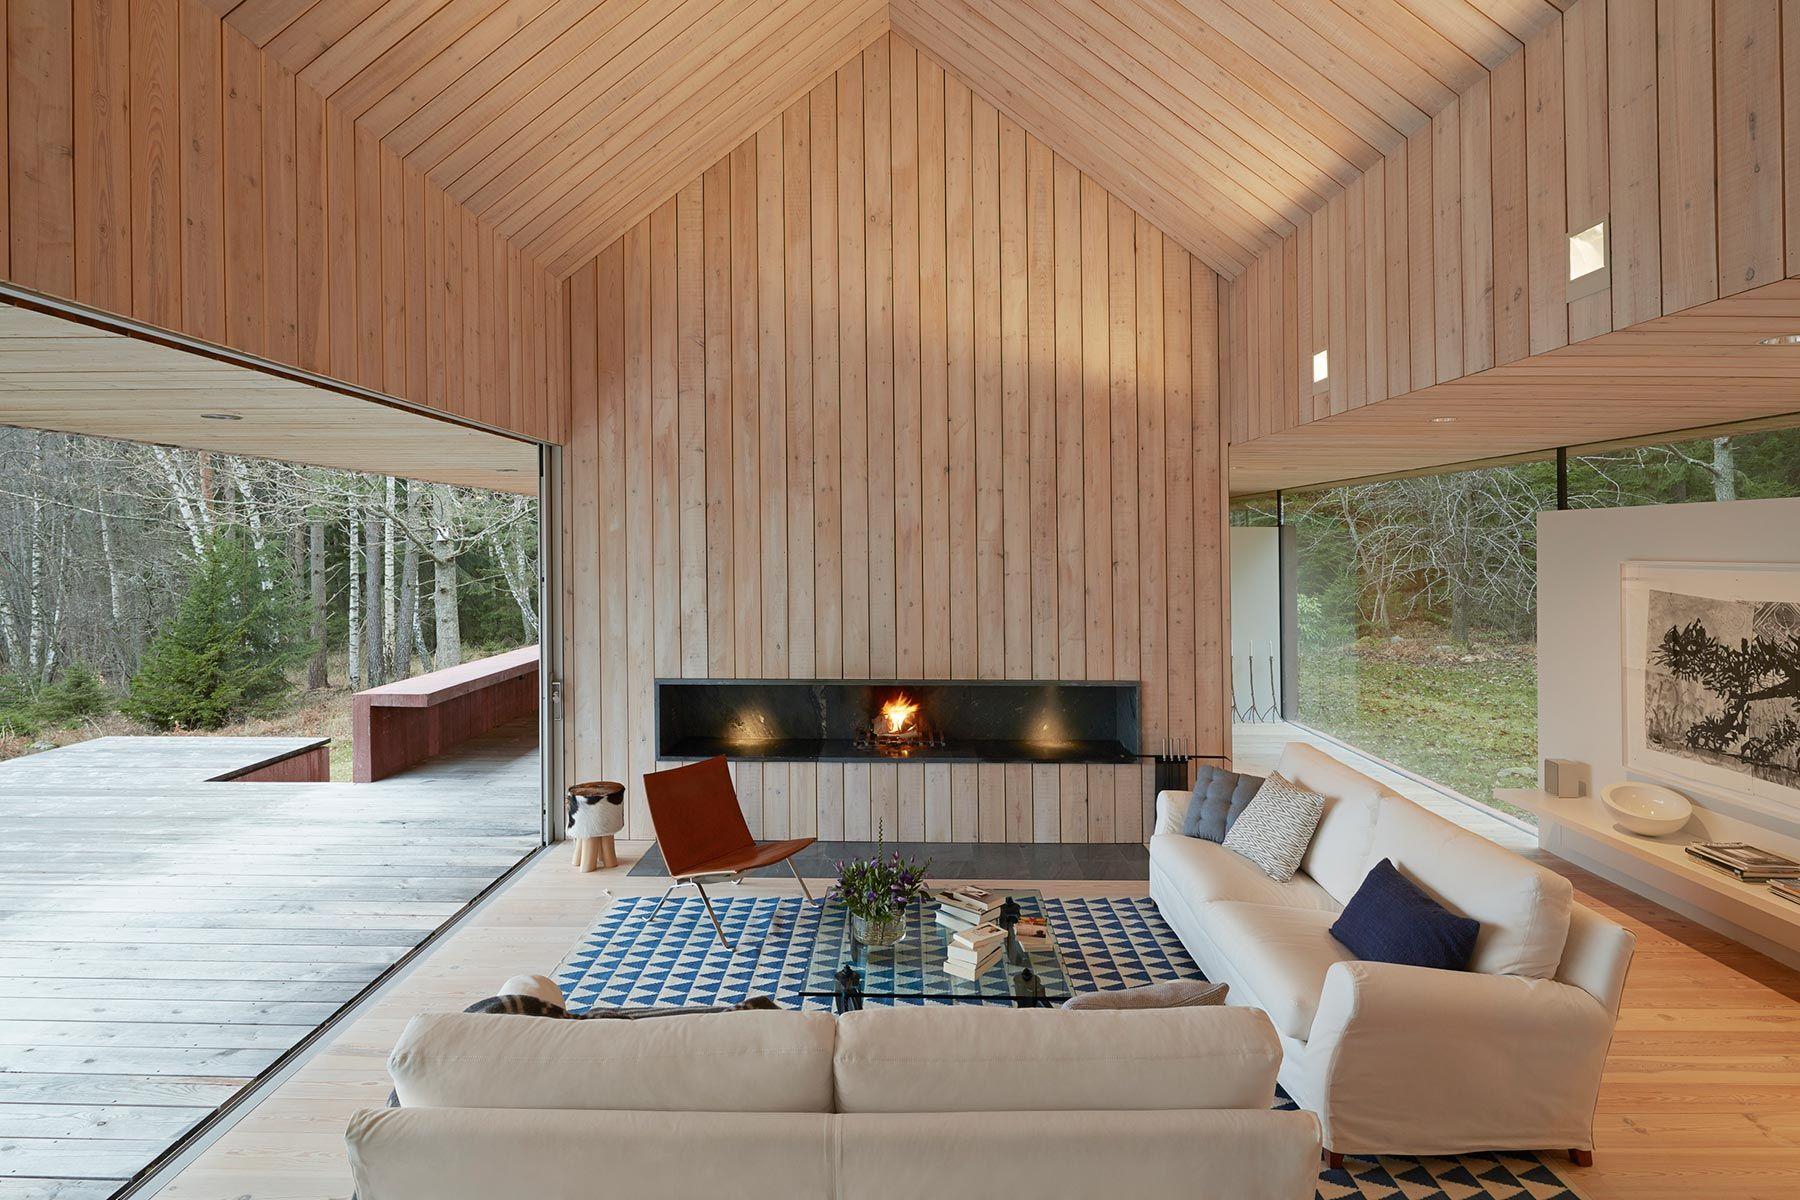 Summerhouse Svartn Wrb Architects Architecture